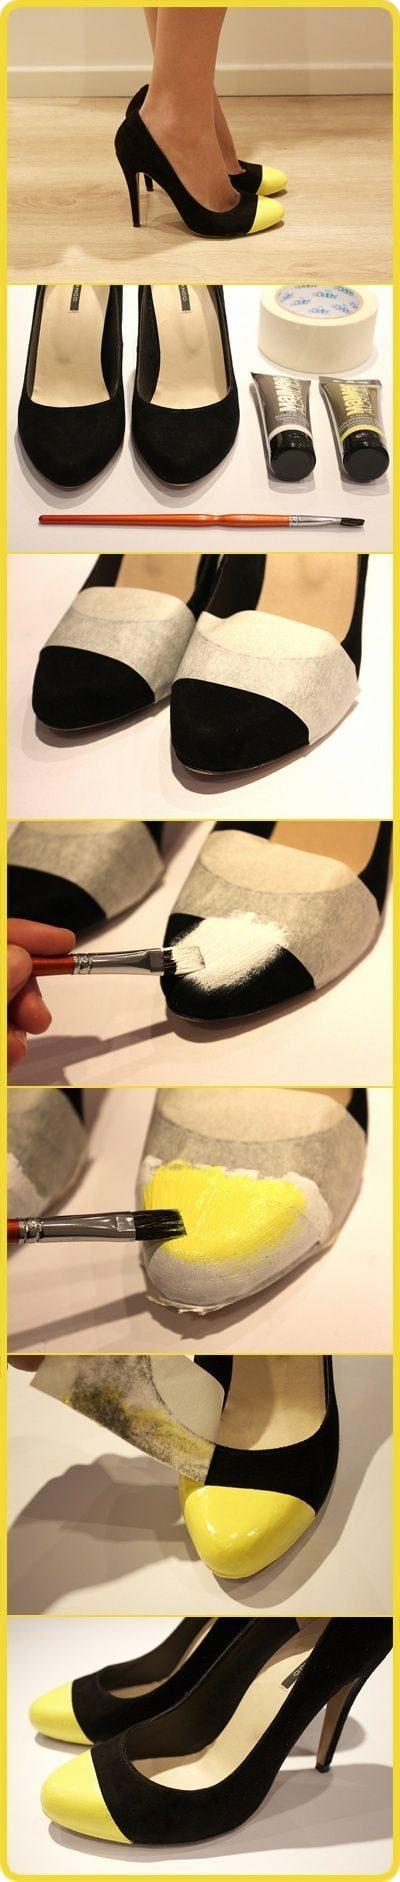 Креативные идеи переделки обуви